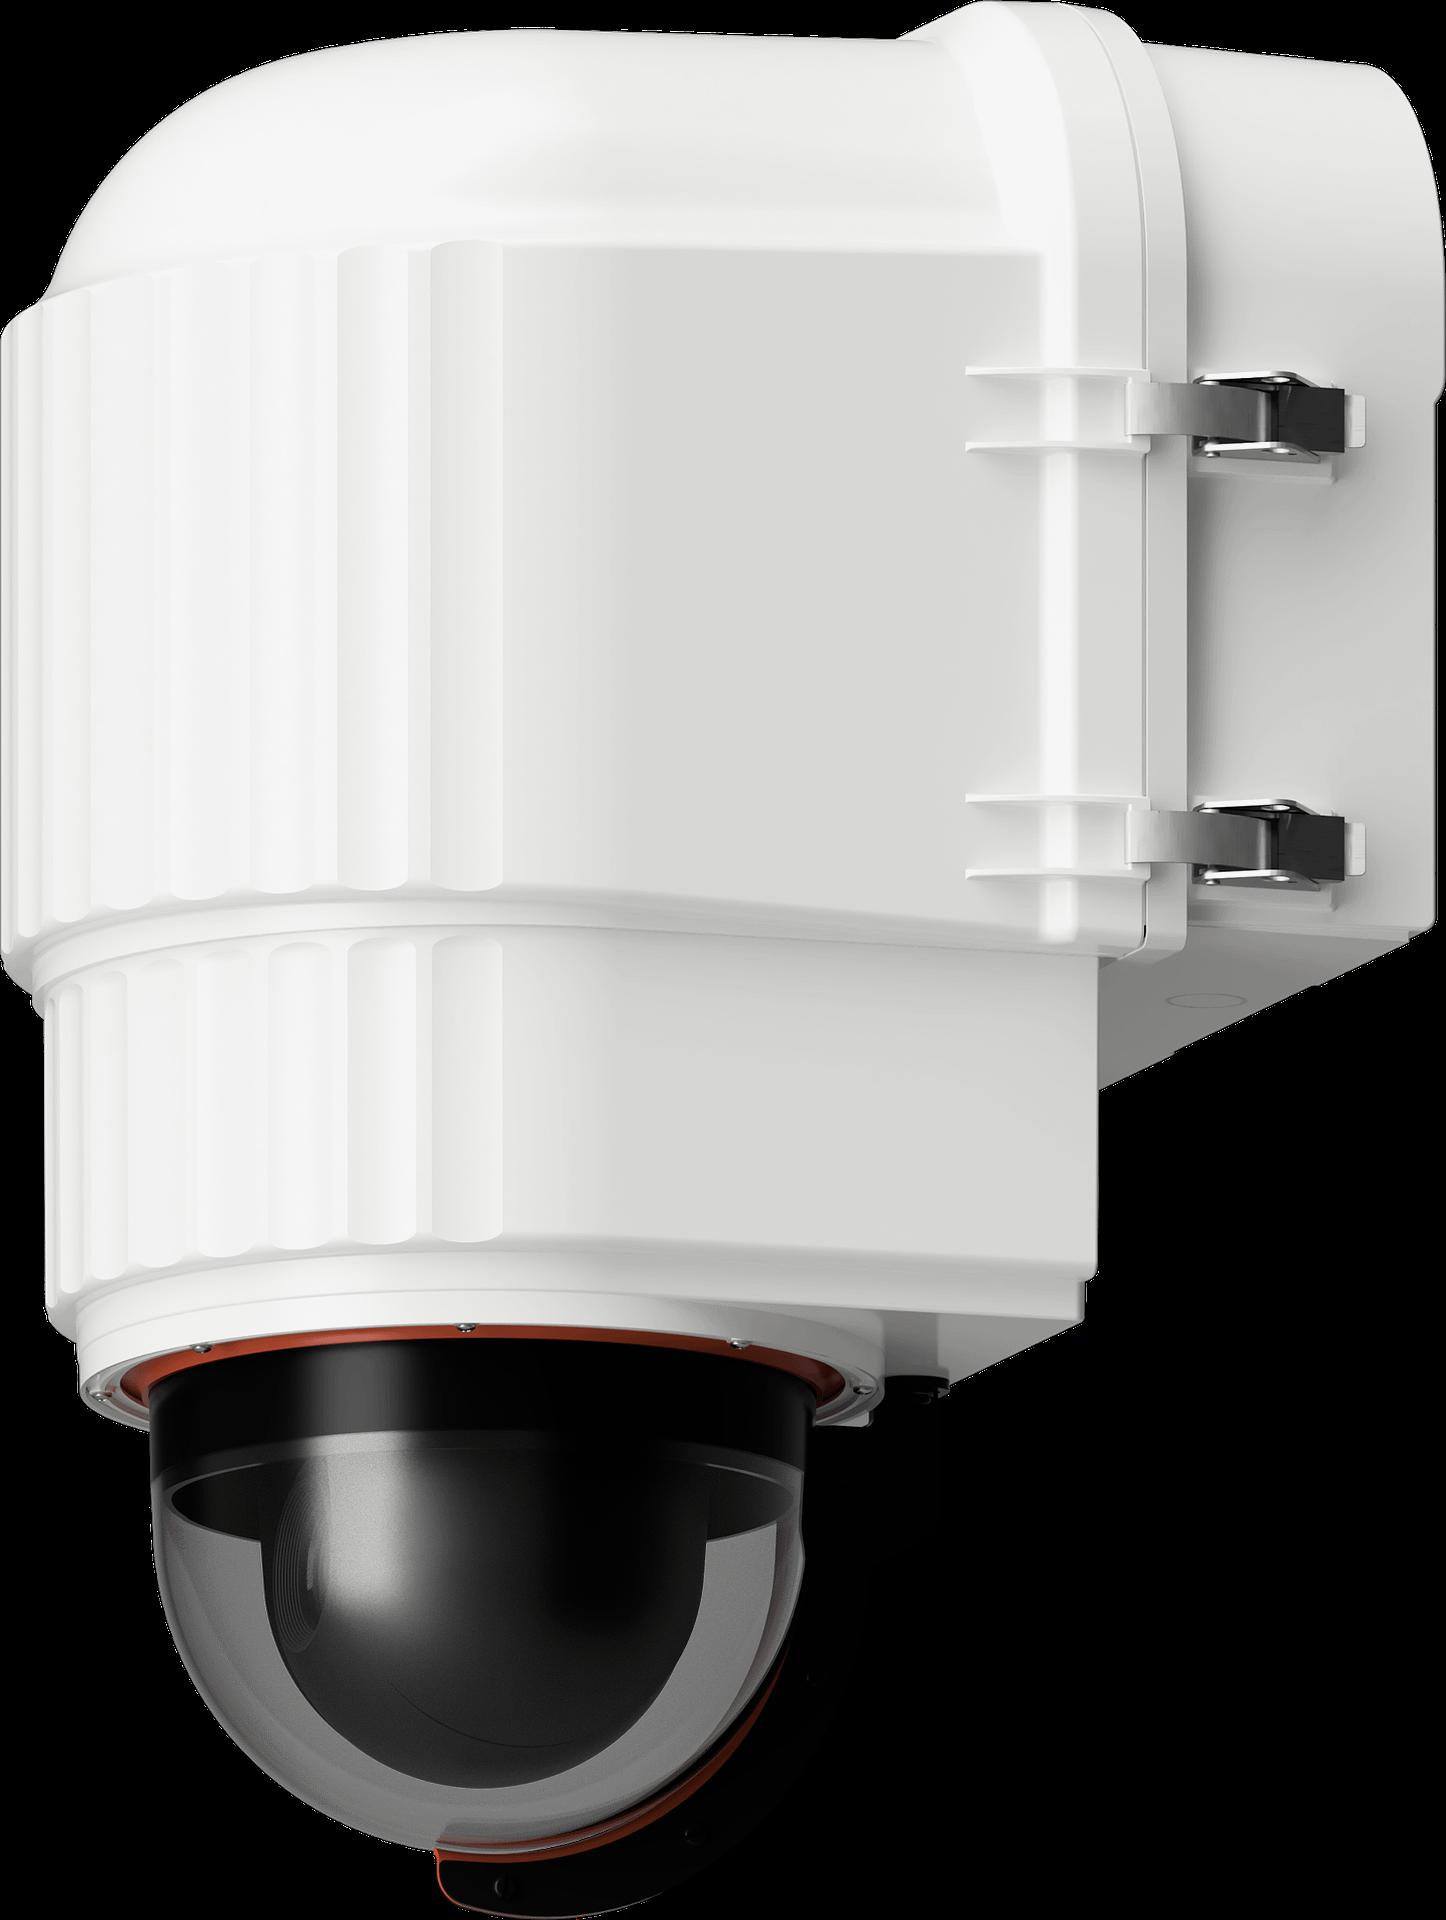 x stream designs xrain ev climate controlled camera enclosure se